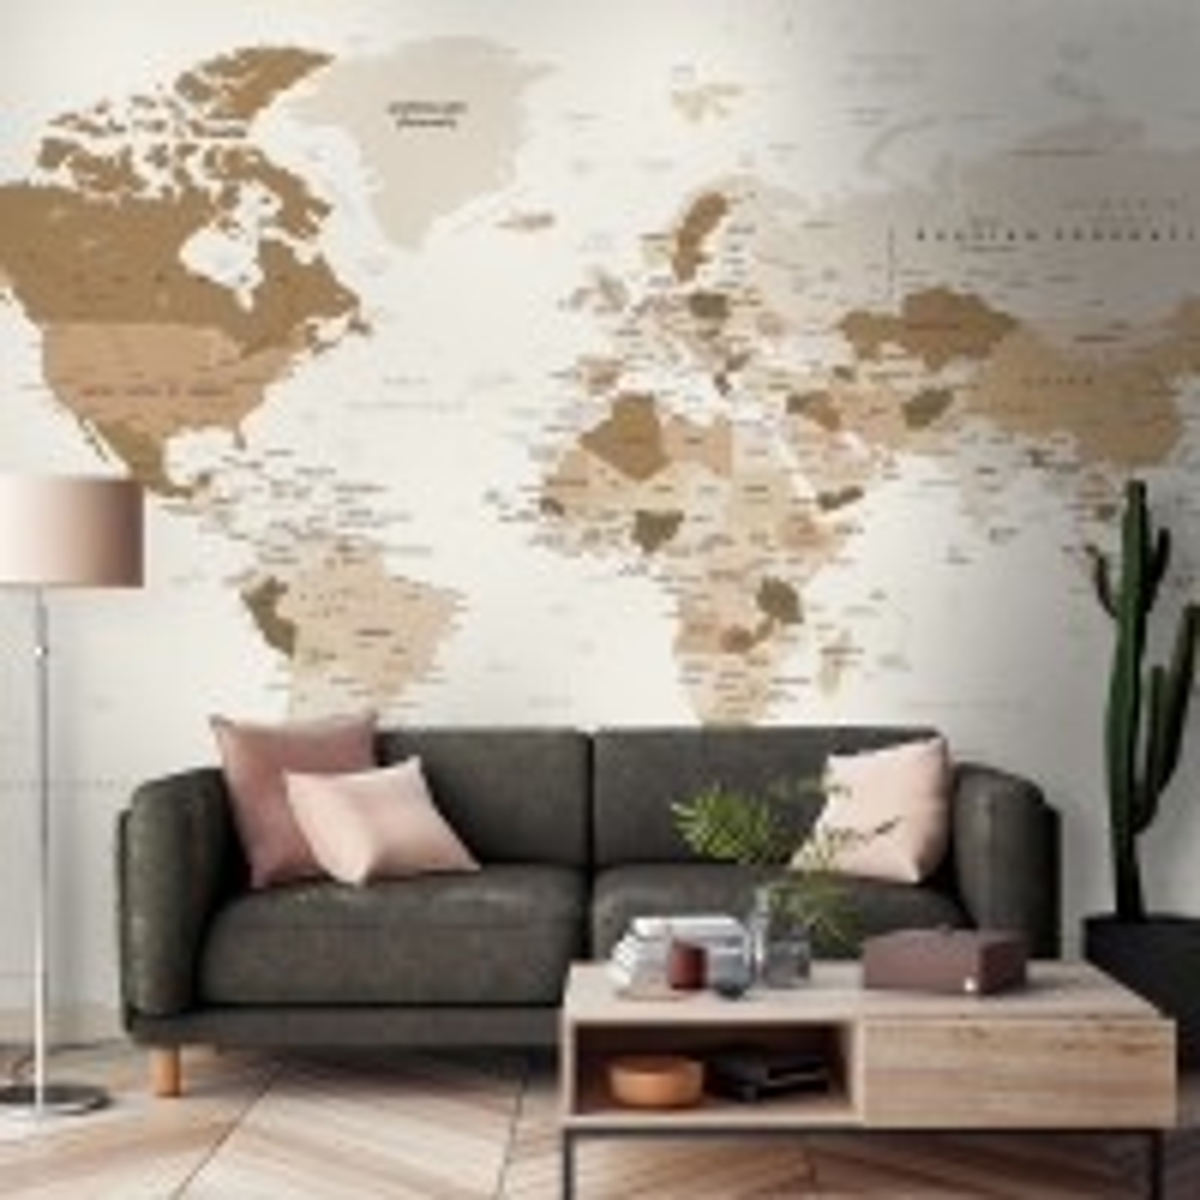 Brown Political Map Wallpaper Mural